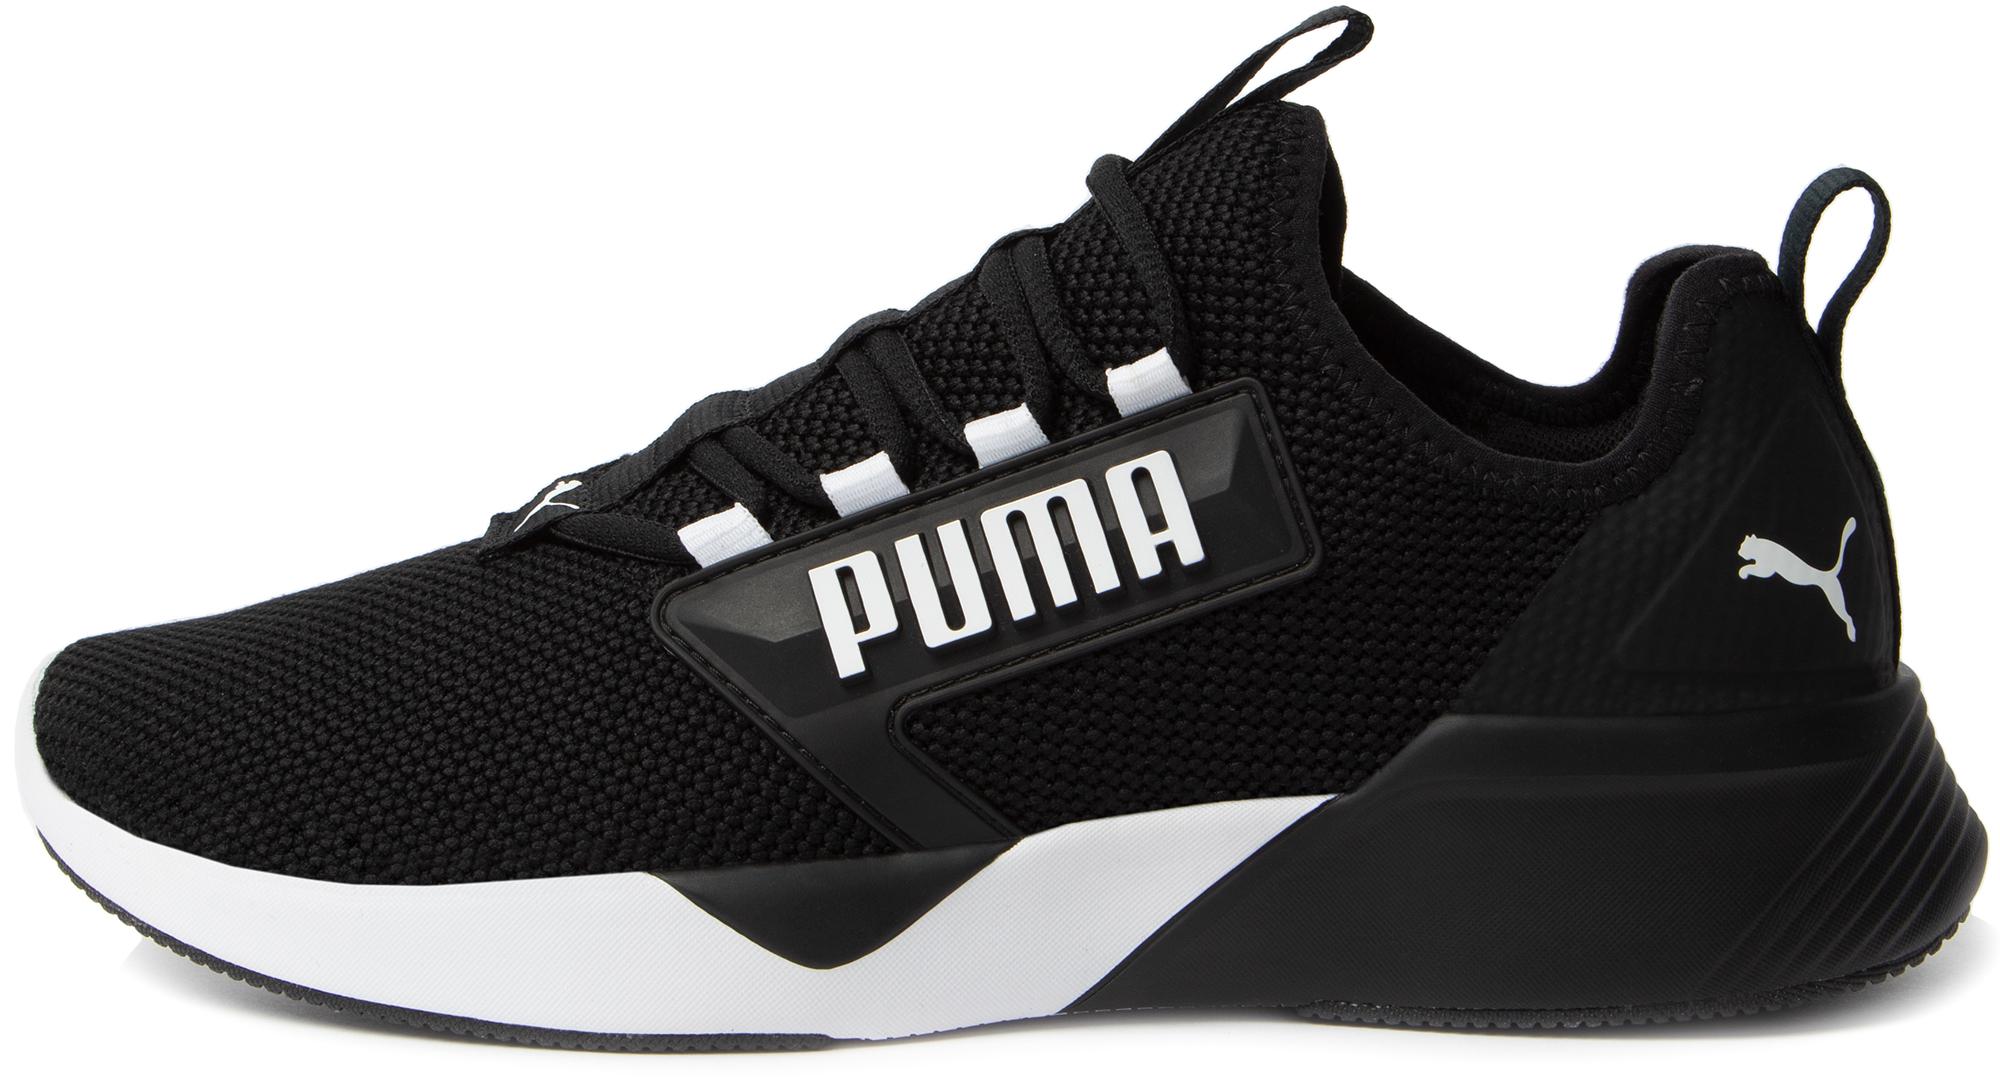 Puma Кроссовки мужские Puma Retaliate, размер 46 puma кроссовки мужские puma hybrid nx ozone размер 41